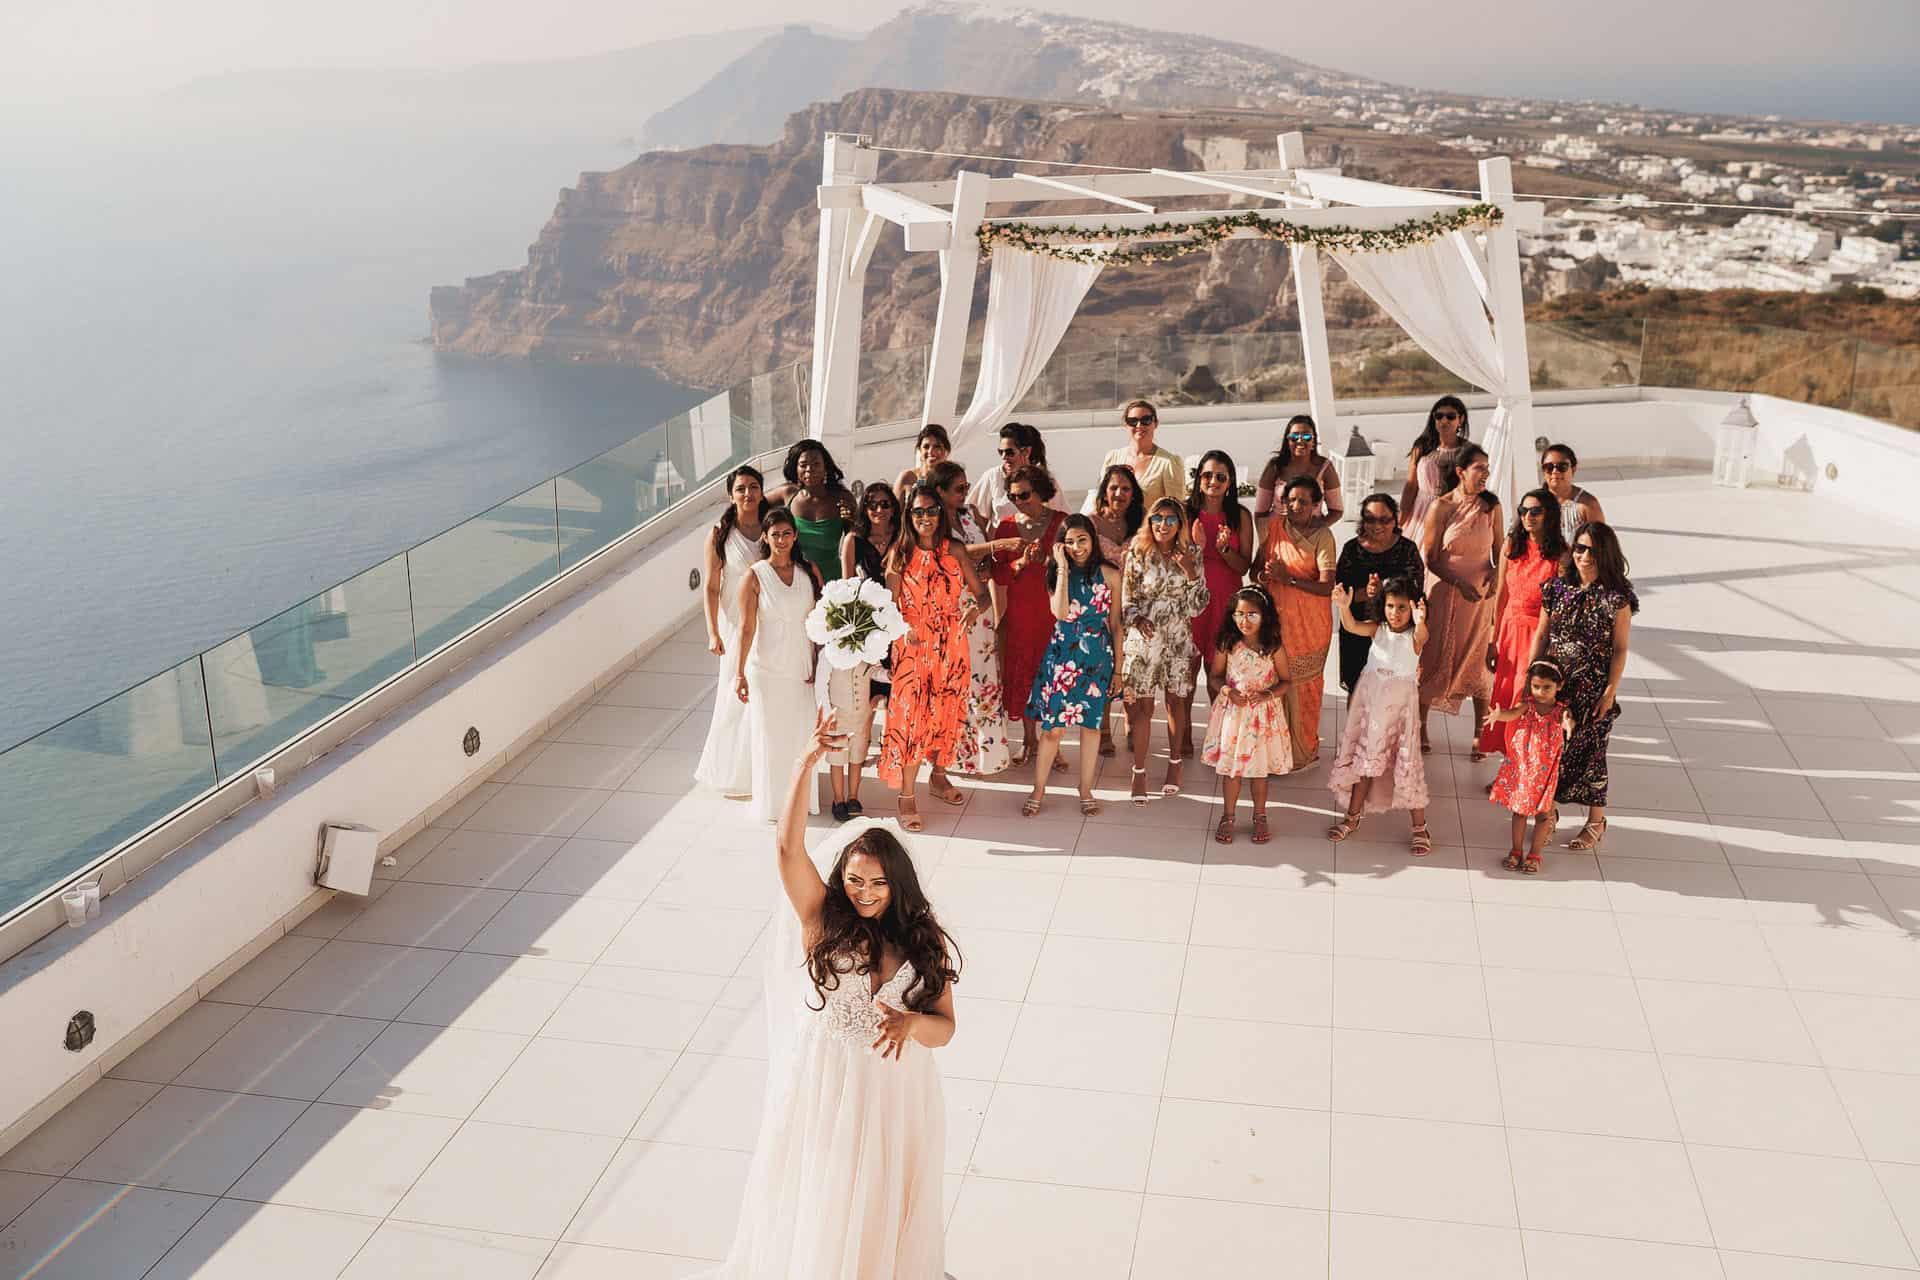 santo winery weddings santorini